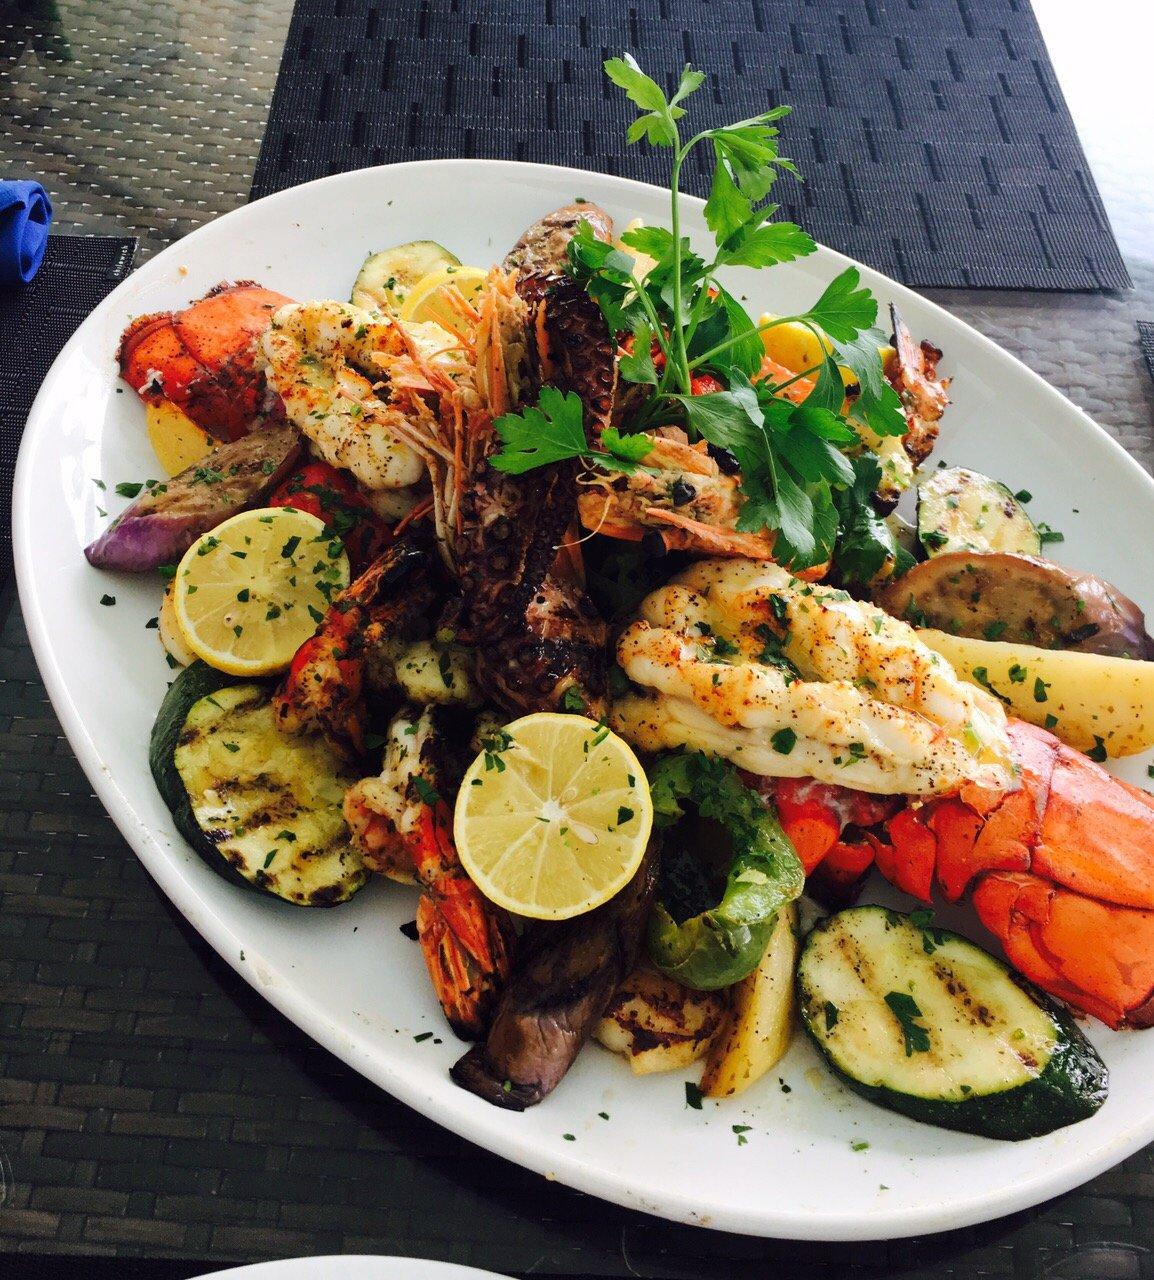 The 10 Best Miami Beach Restaurants 2017 TripAdvisor